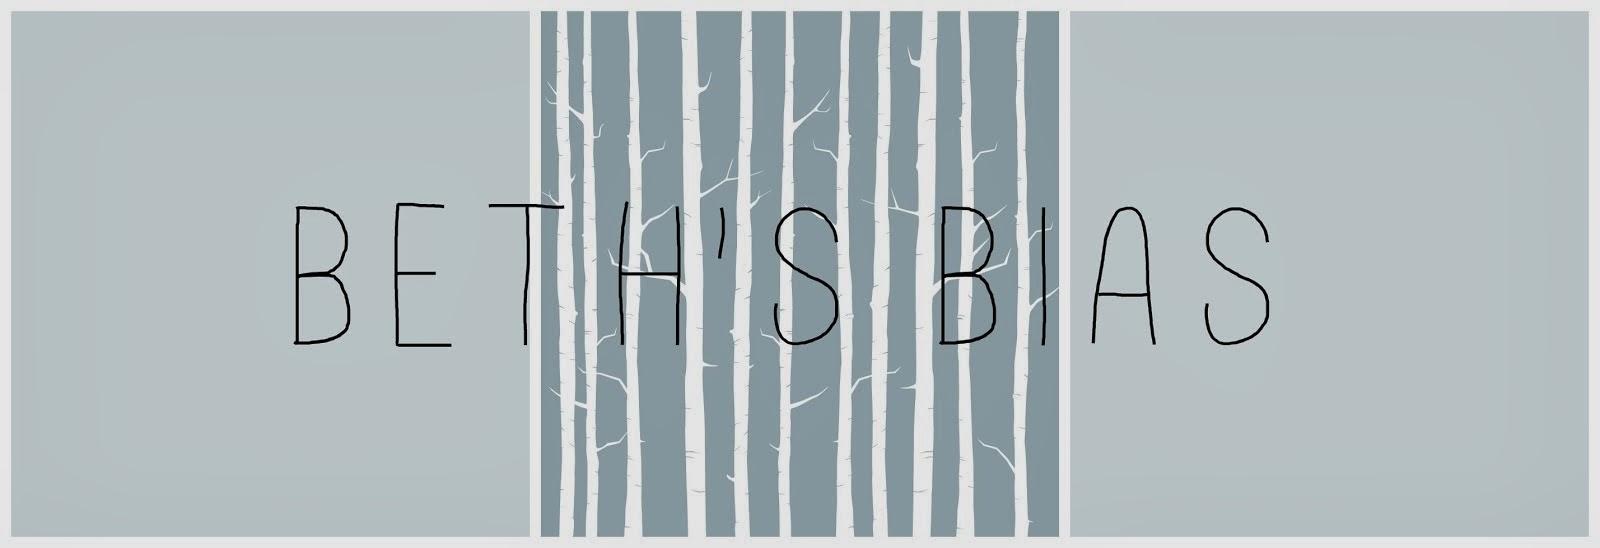 BETH'S BIAS